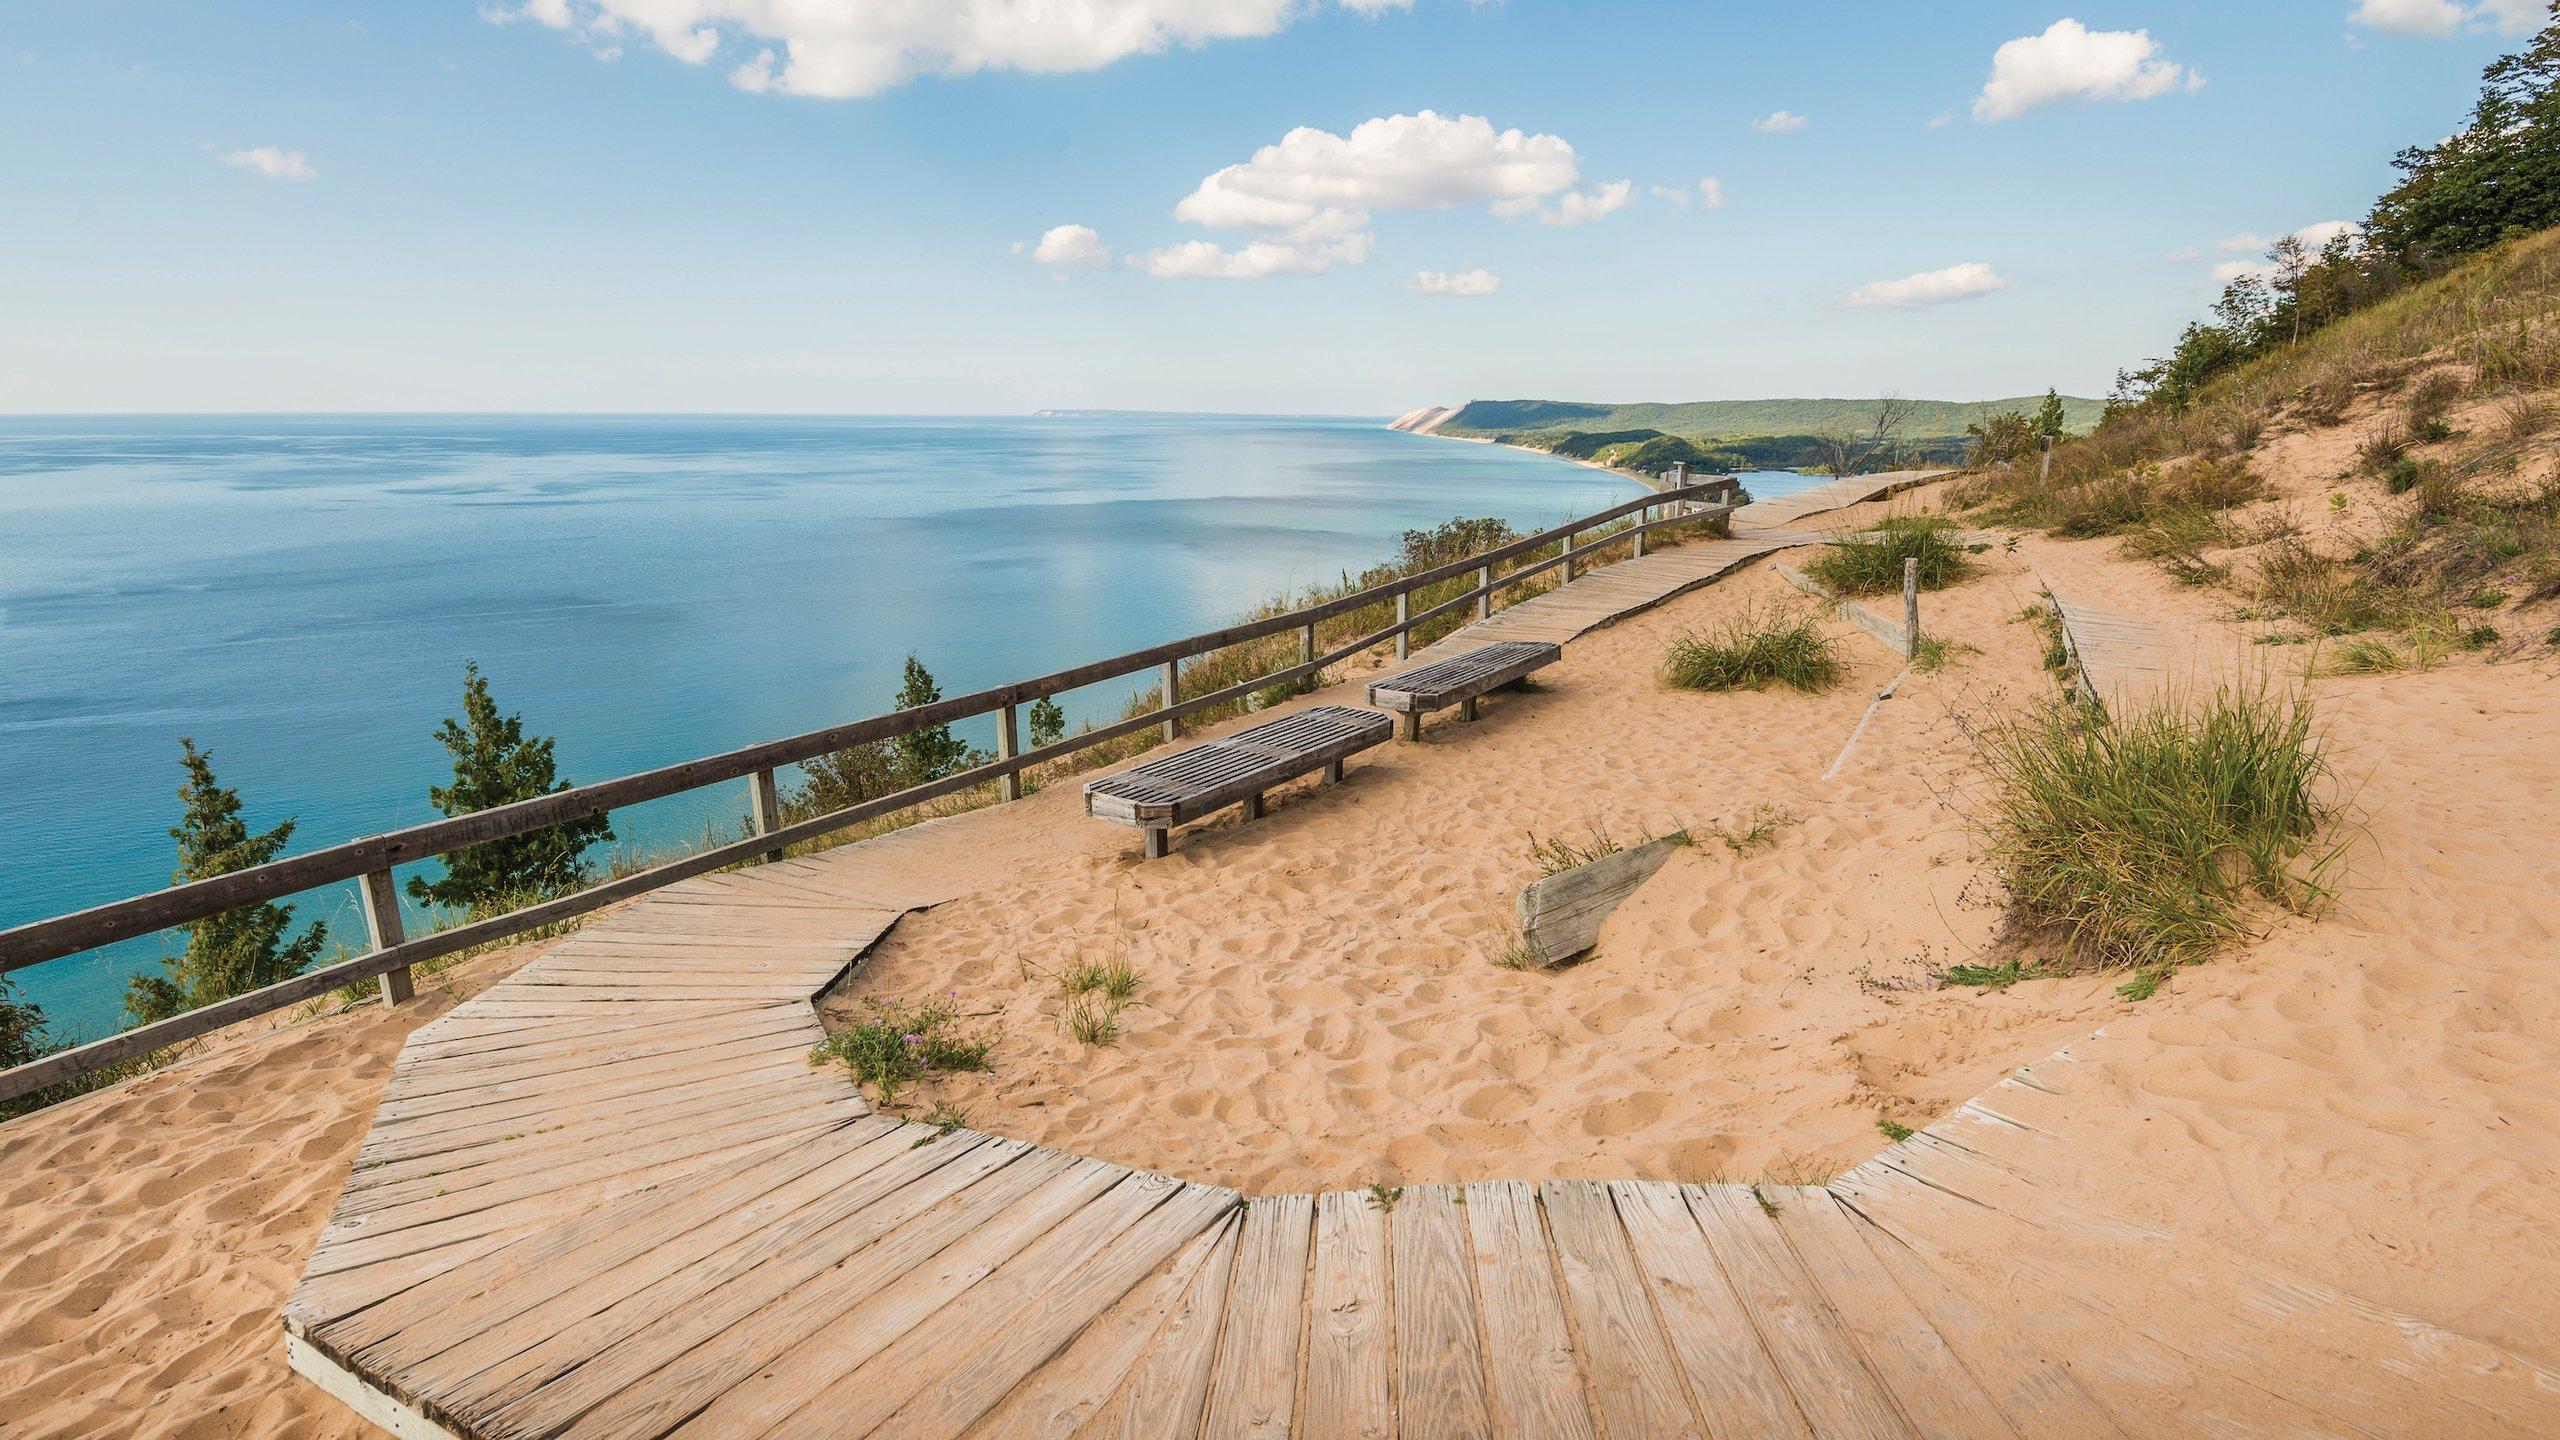 10 Best Beach Hotels In Traverse City